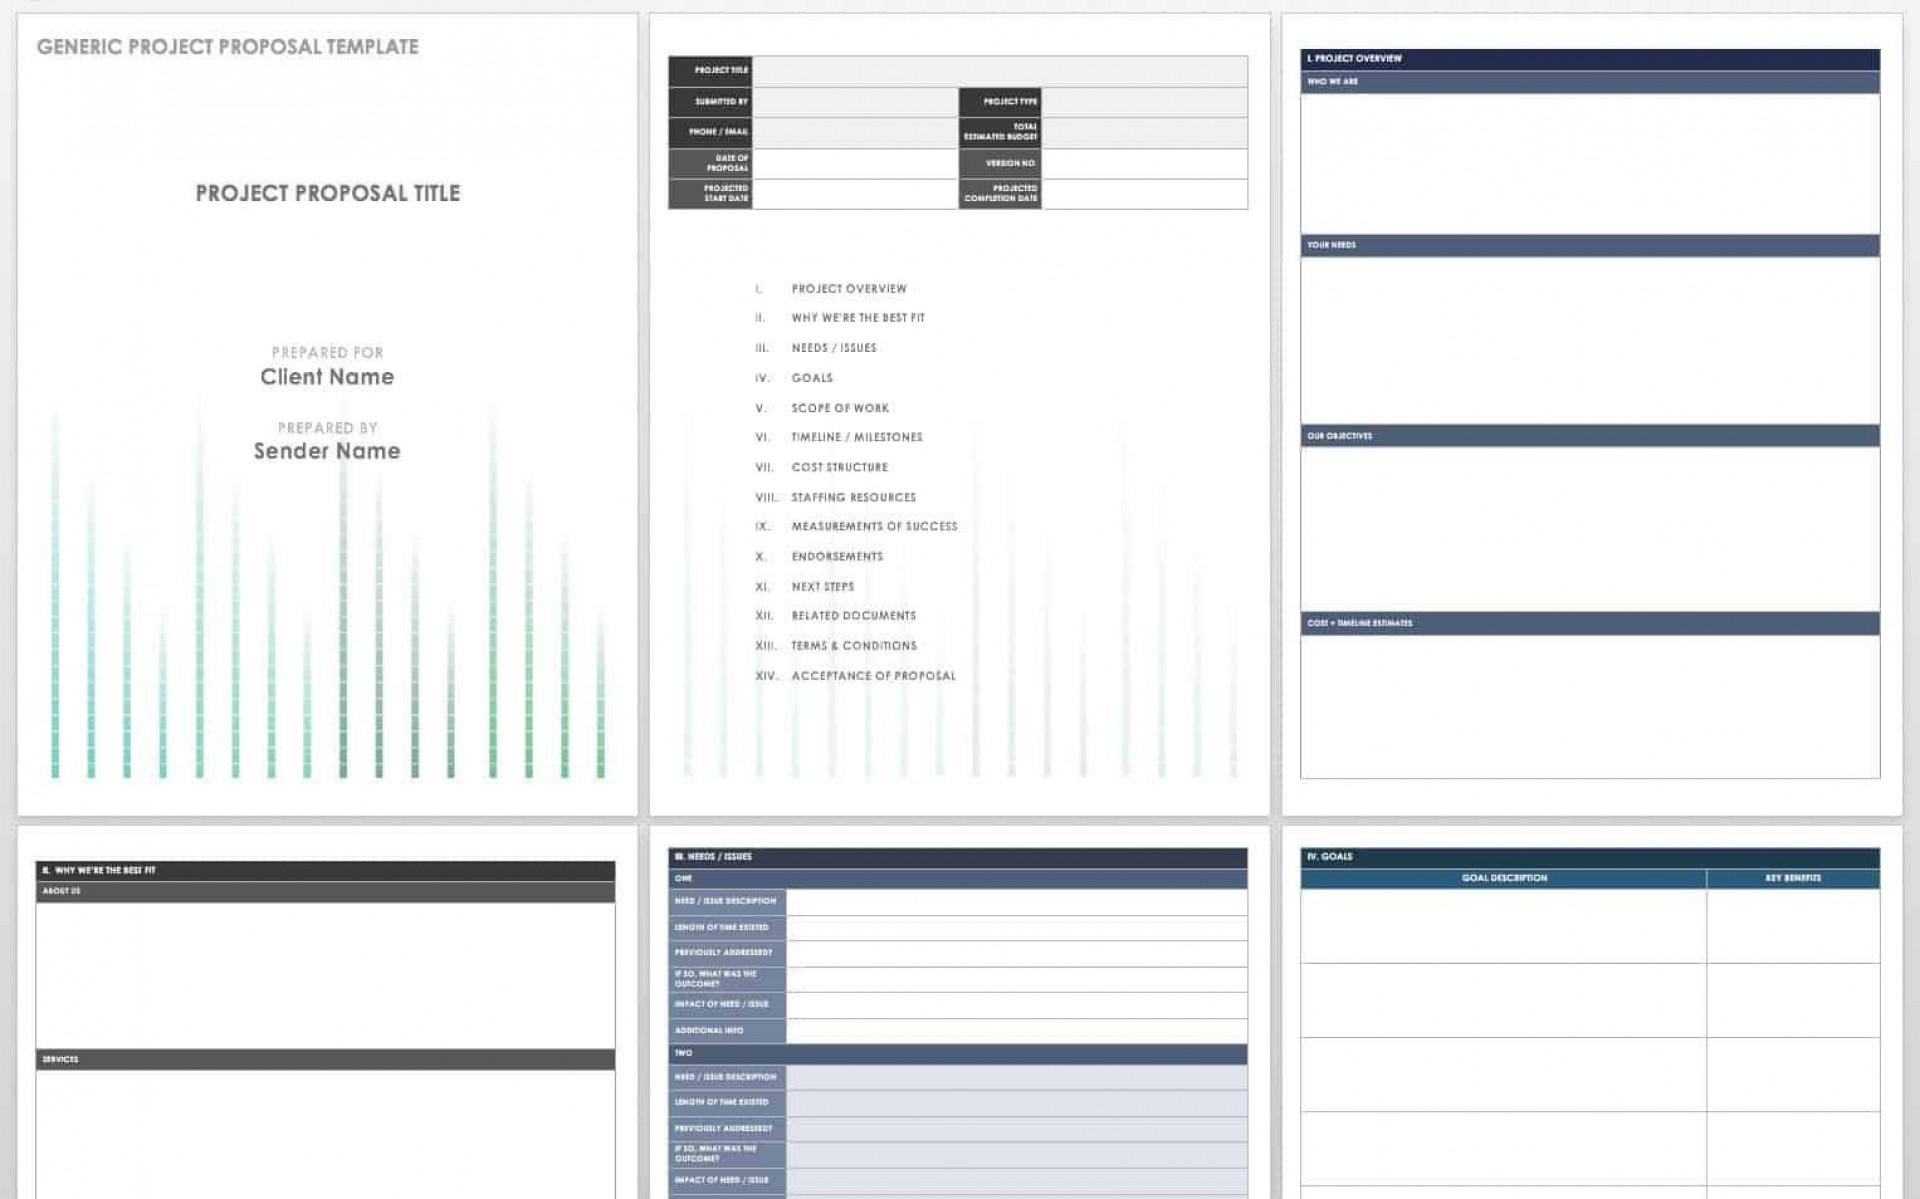 007 Best Web Development Proposal Template Pdf Concept  Sample1920